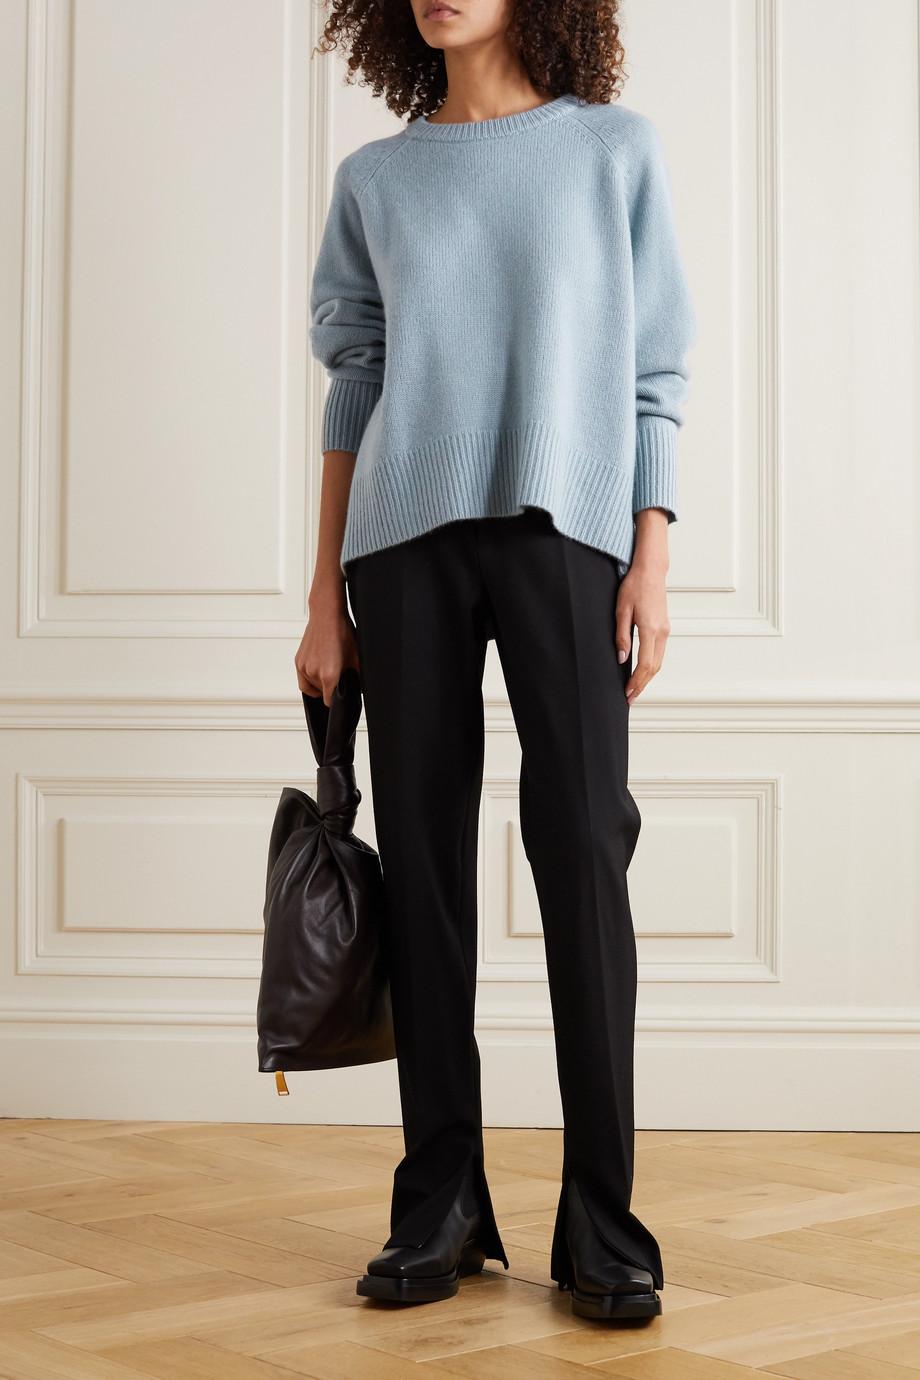 Arch4 + NET SUSTAIN Bredin cashmere sweater